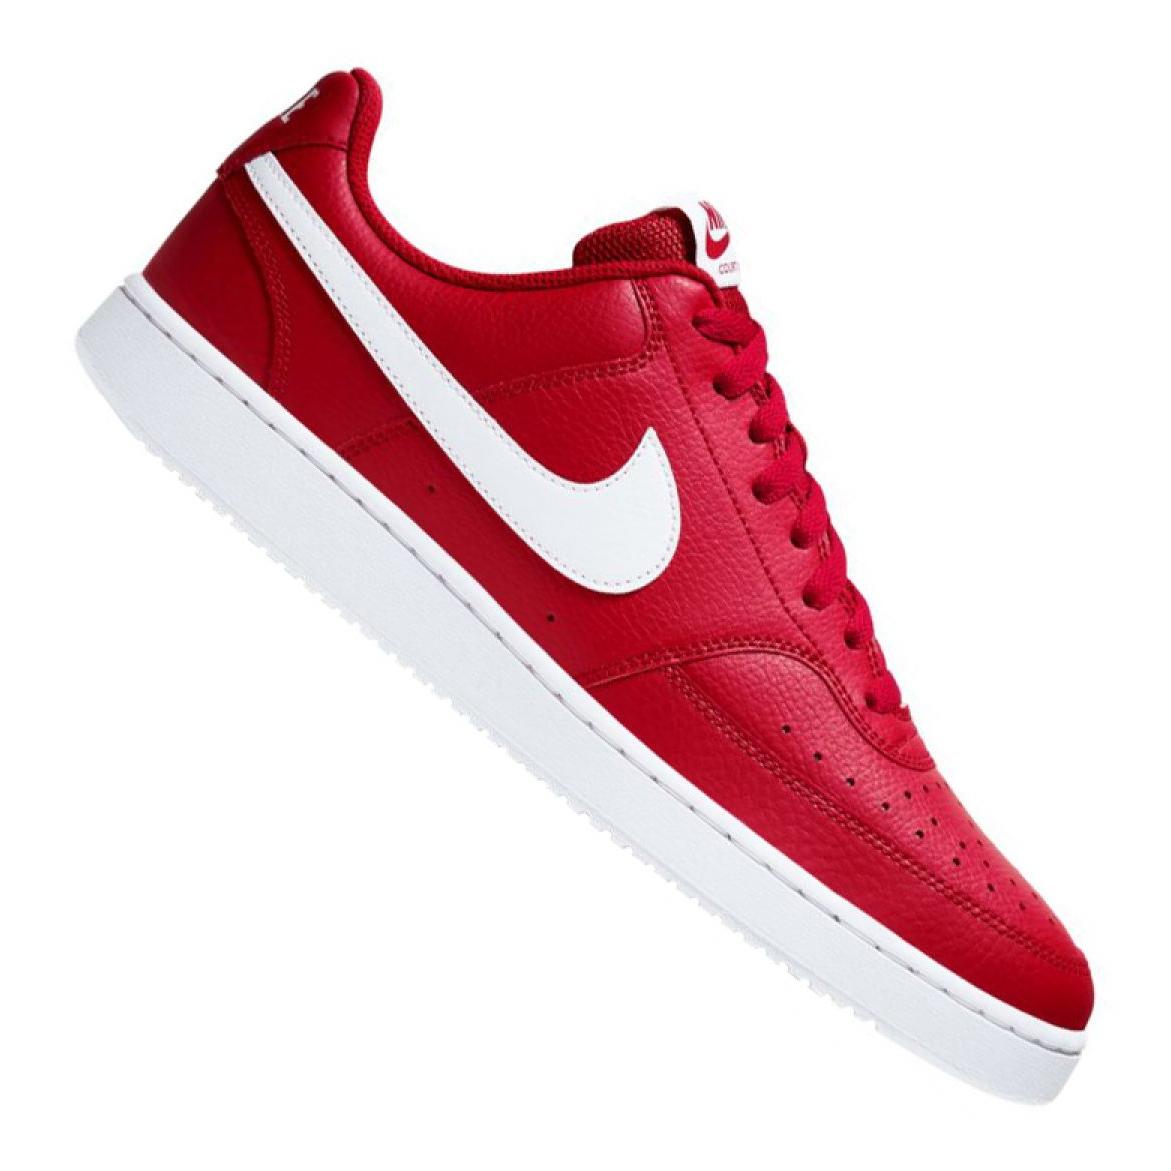 Sapatilhas Nike Court Vision Low M CD5463 600 vermelho